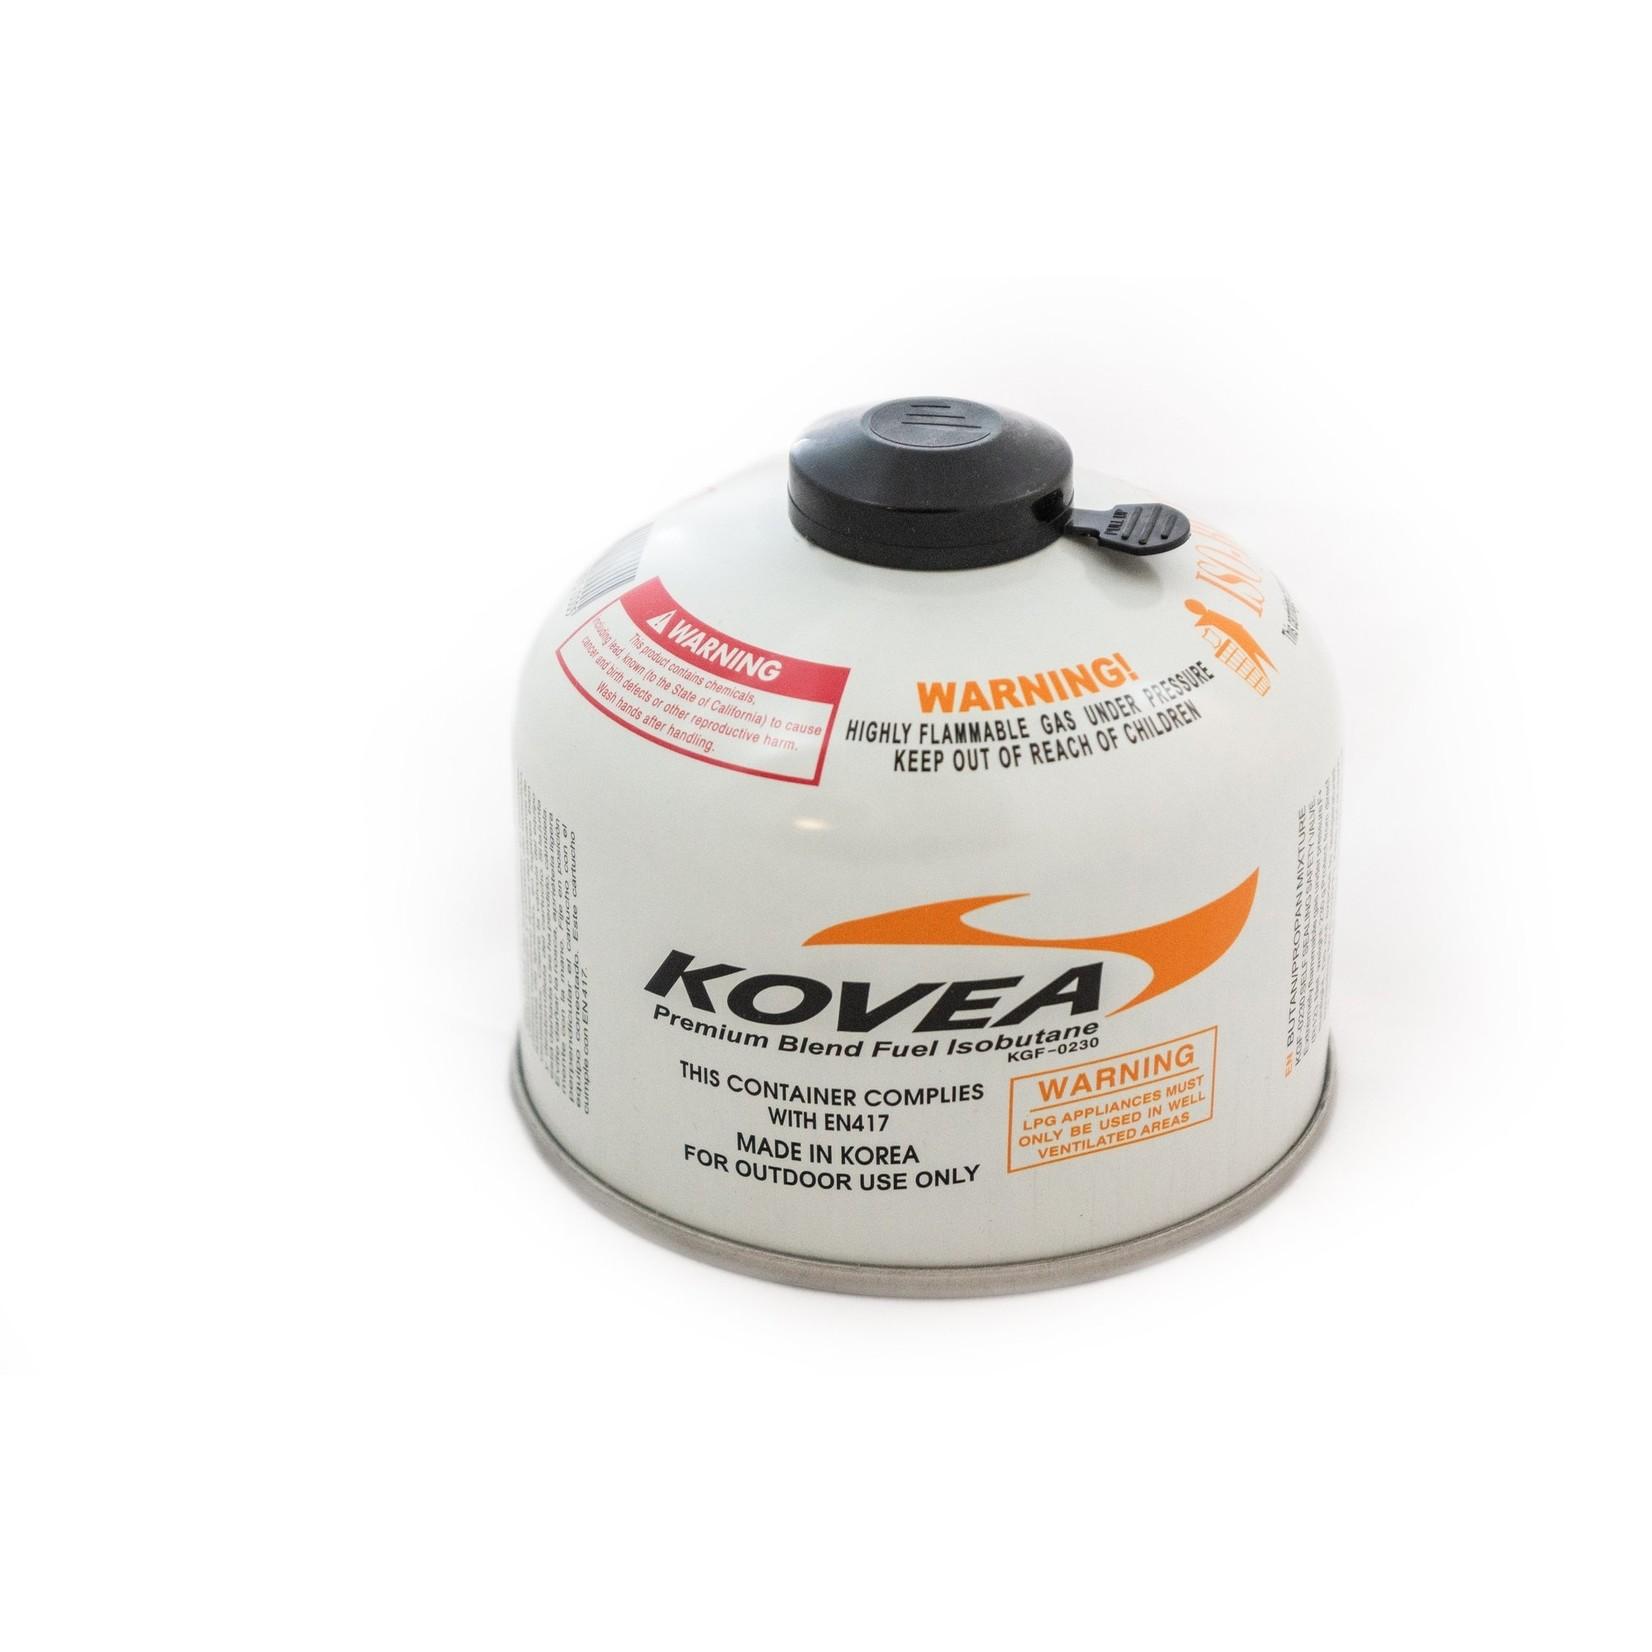 Kovea 230g Screw-on Style Isobutane Gas Canister